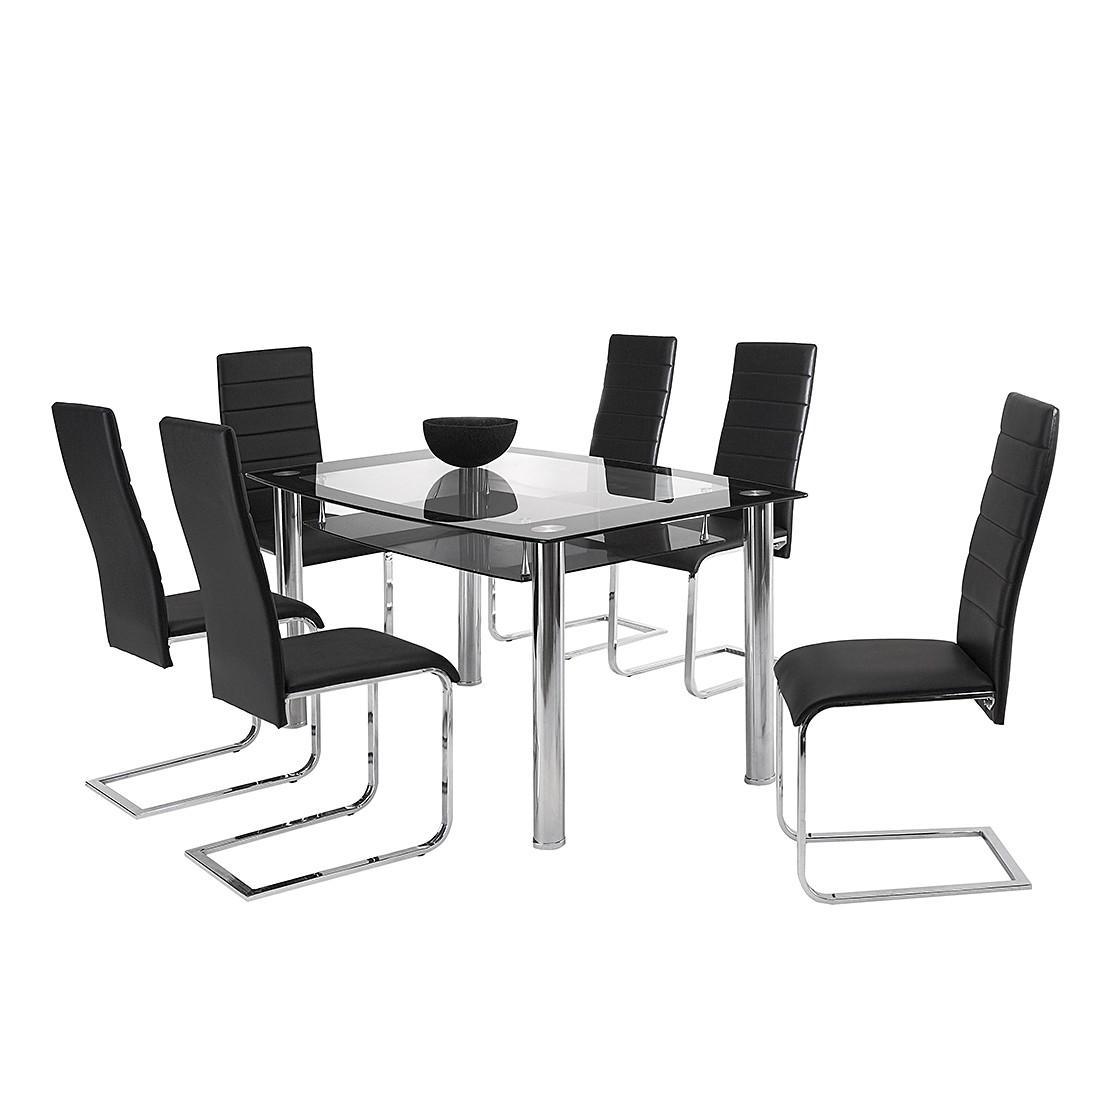 sonstige sets archive seite 5 von 14. Black Bedroom Furniture Sets. Home Design Ideas